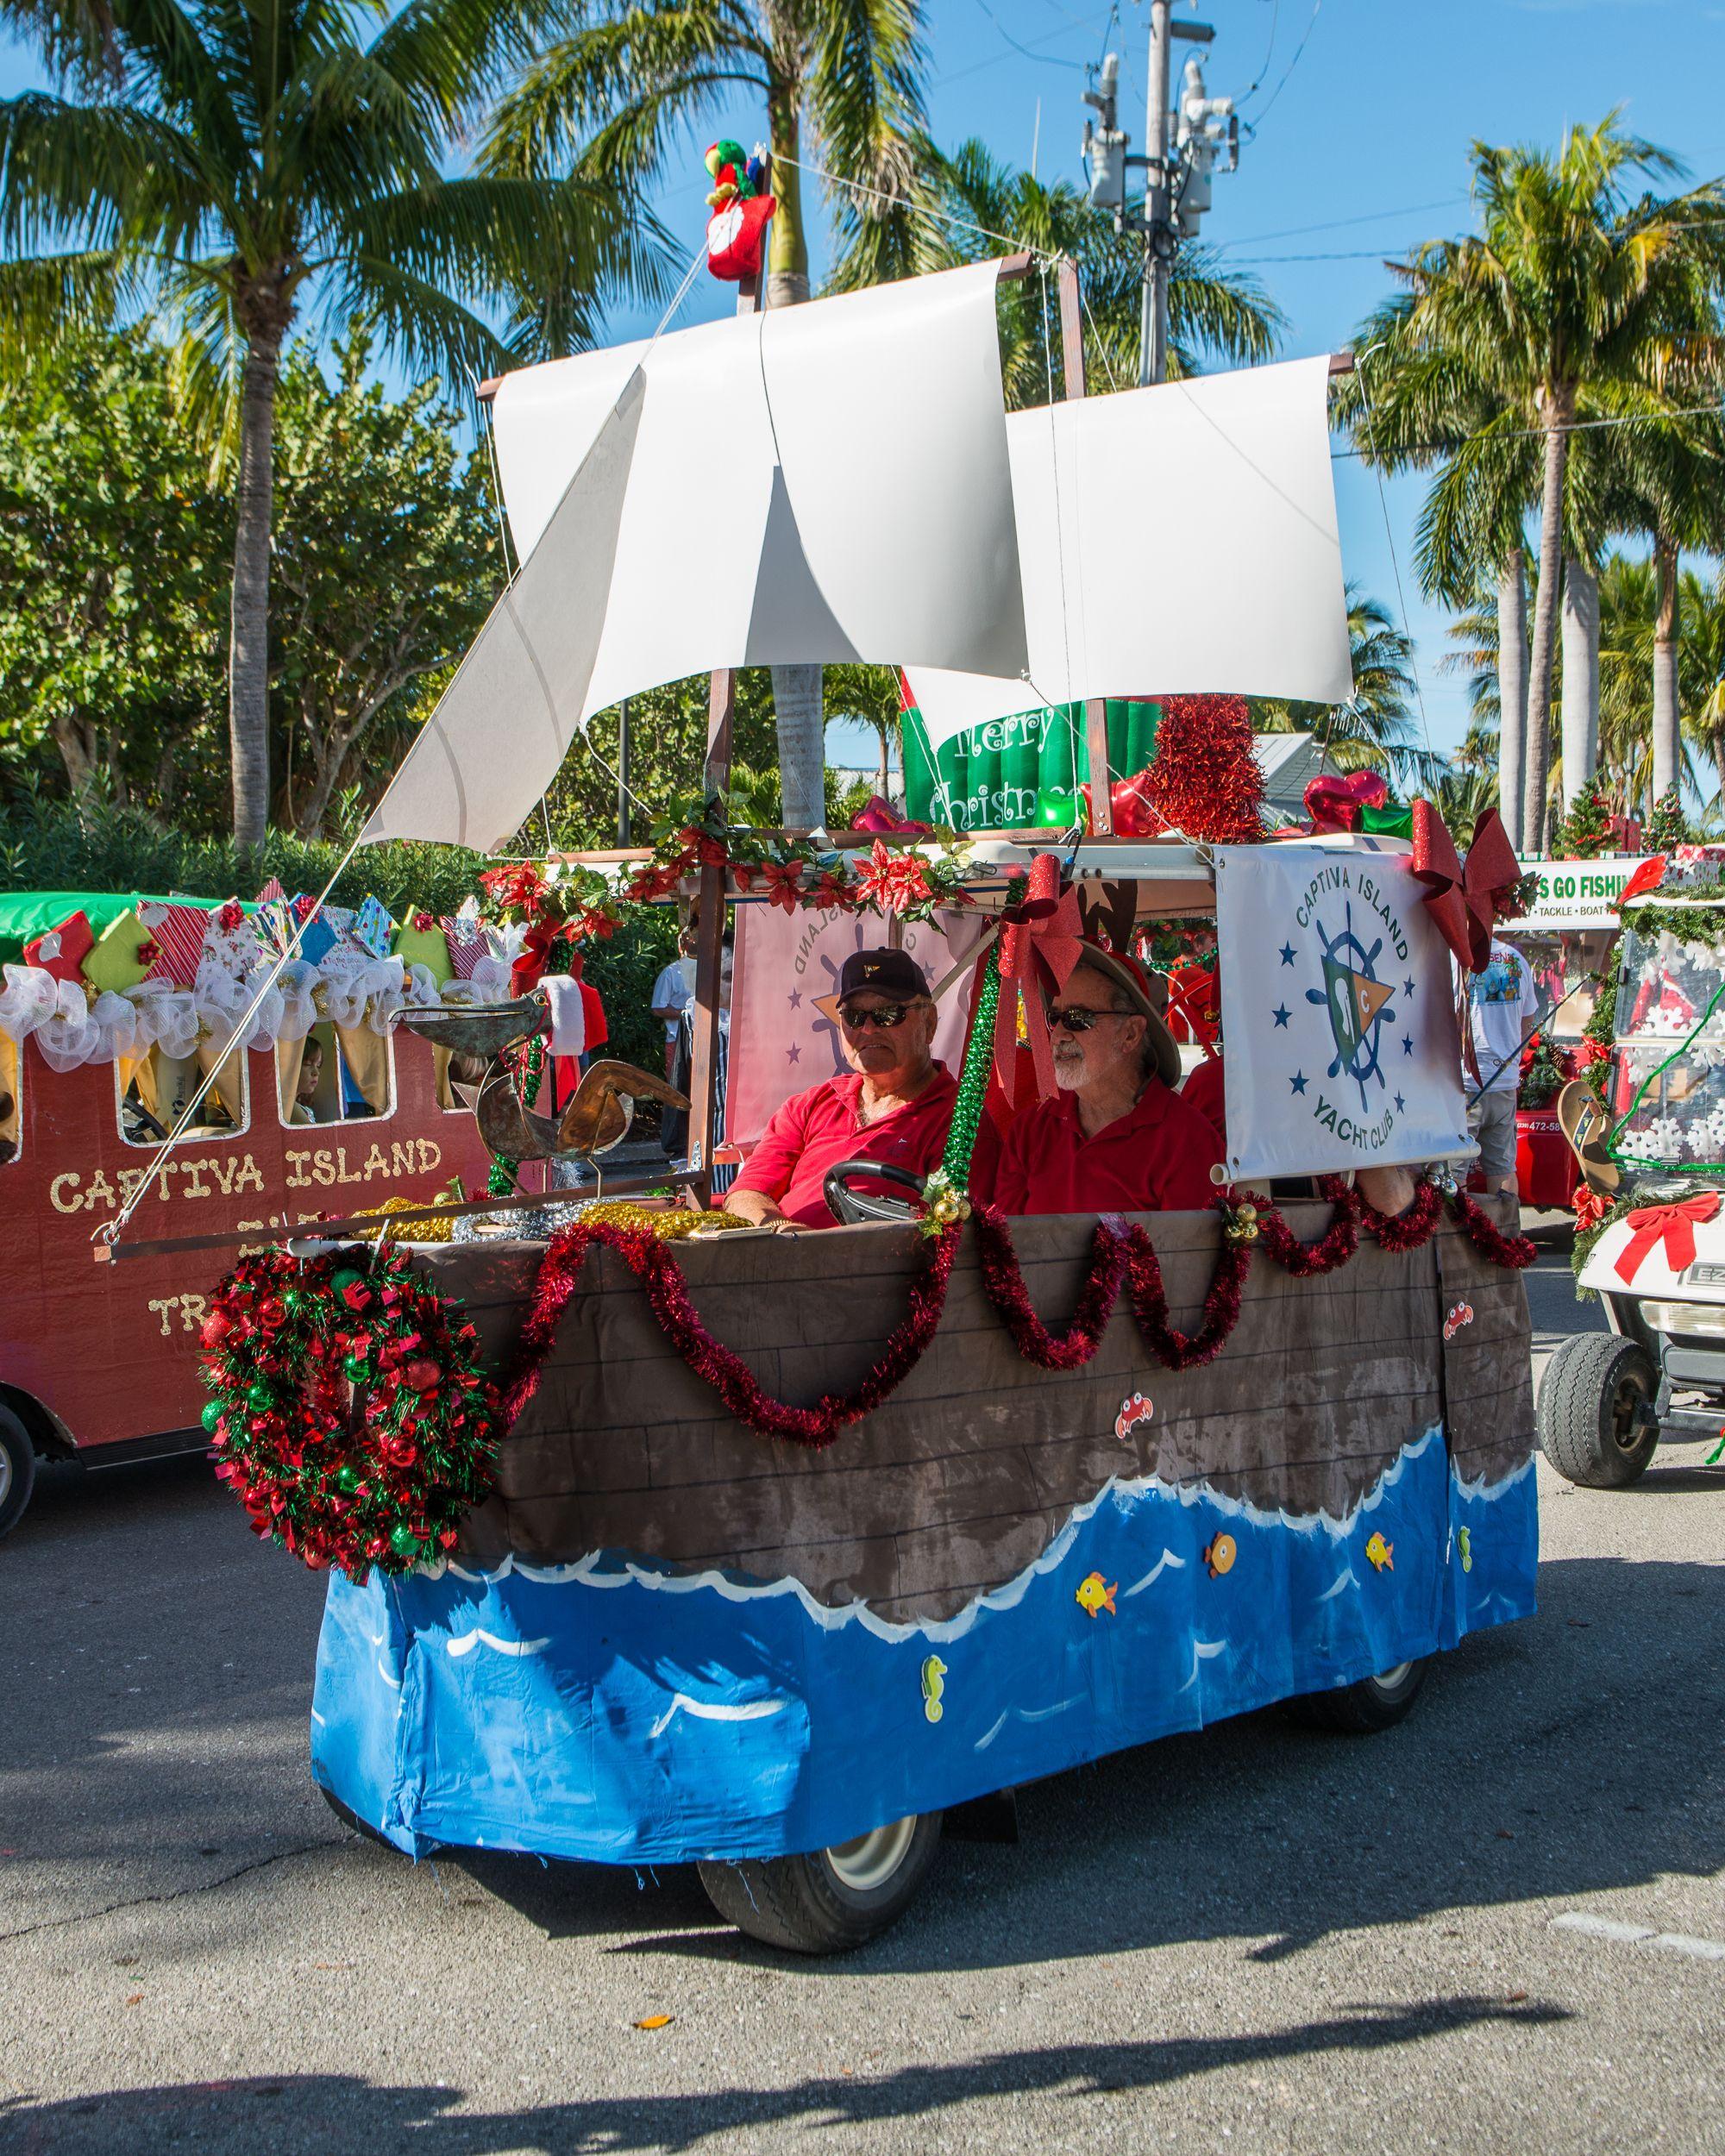 Float Decorations: Captiva Golf Cart Parade